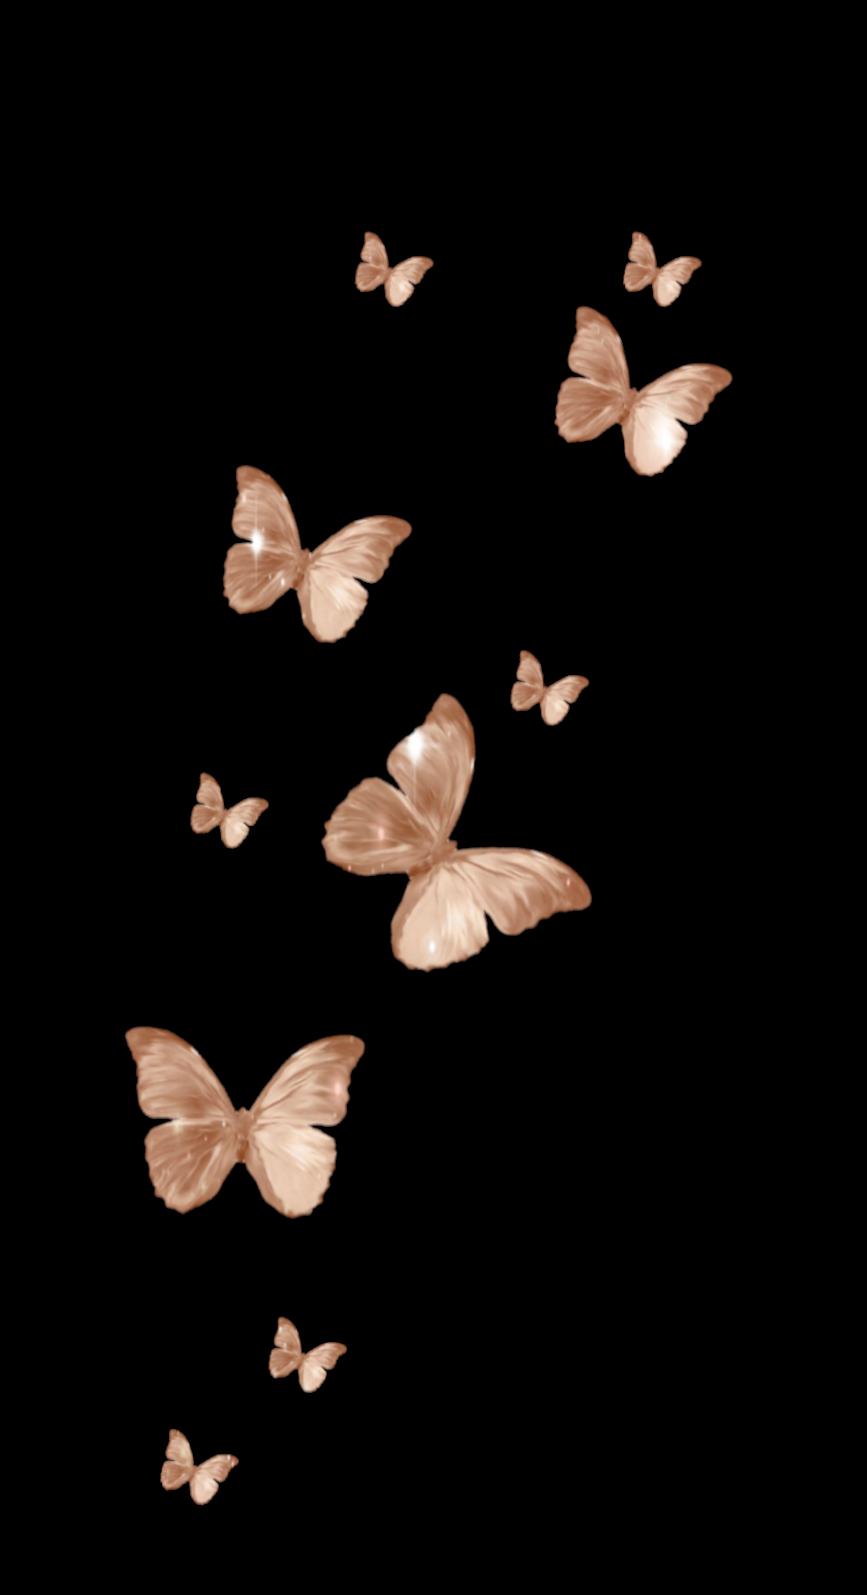 #freetoedit #freetoedit #butterfly #aesthetic #vintage #sticker #aestheticsticker